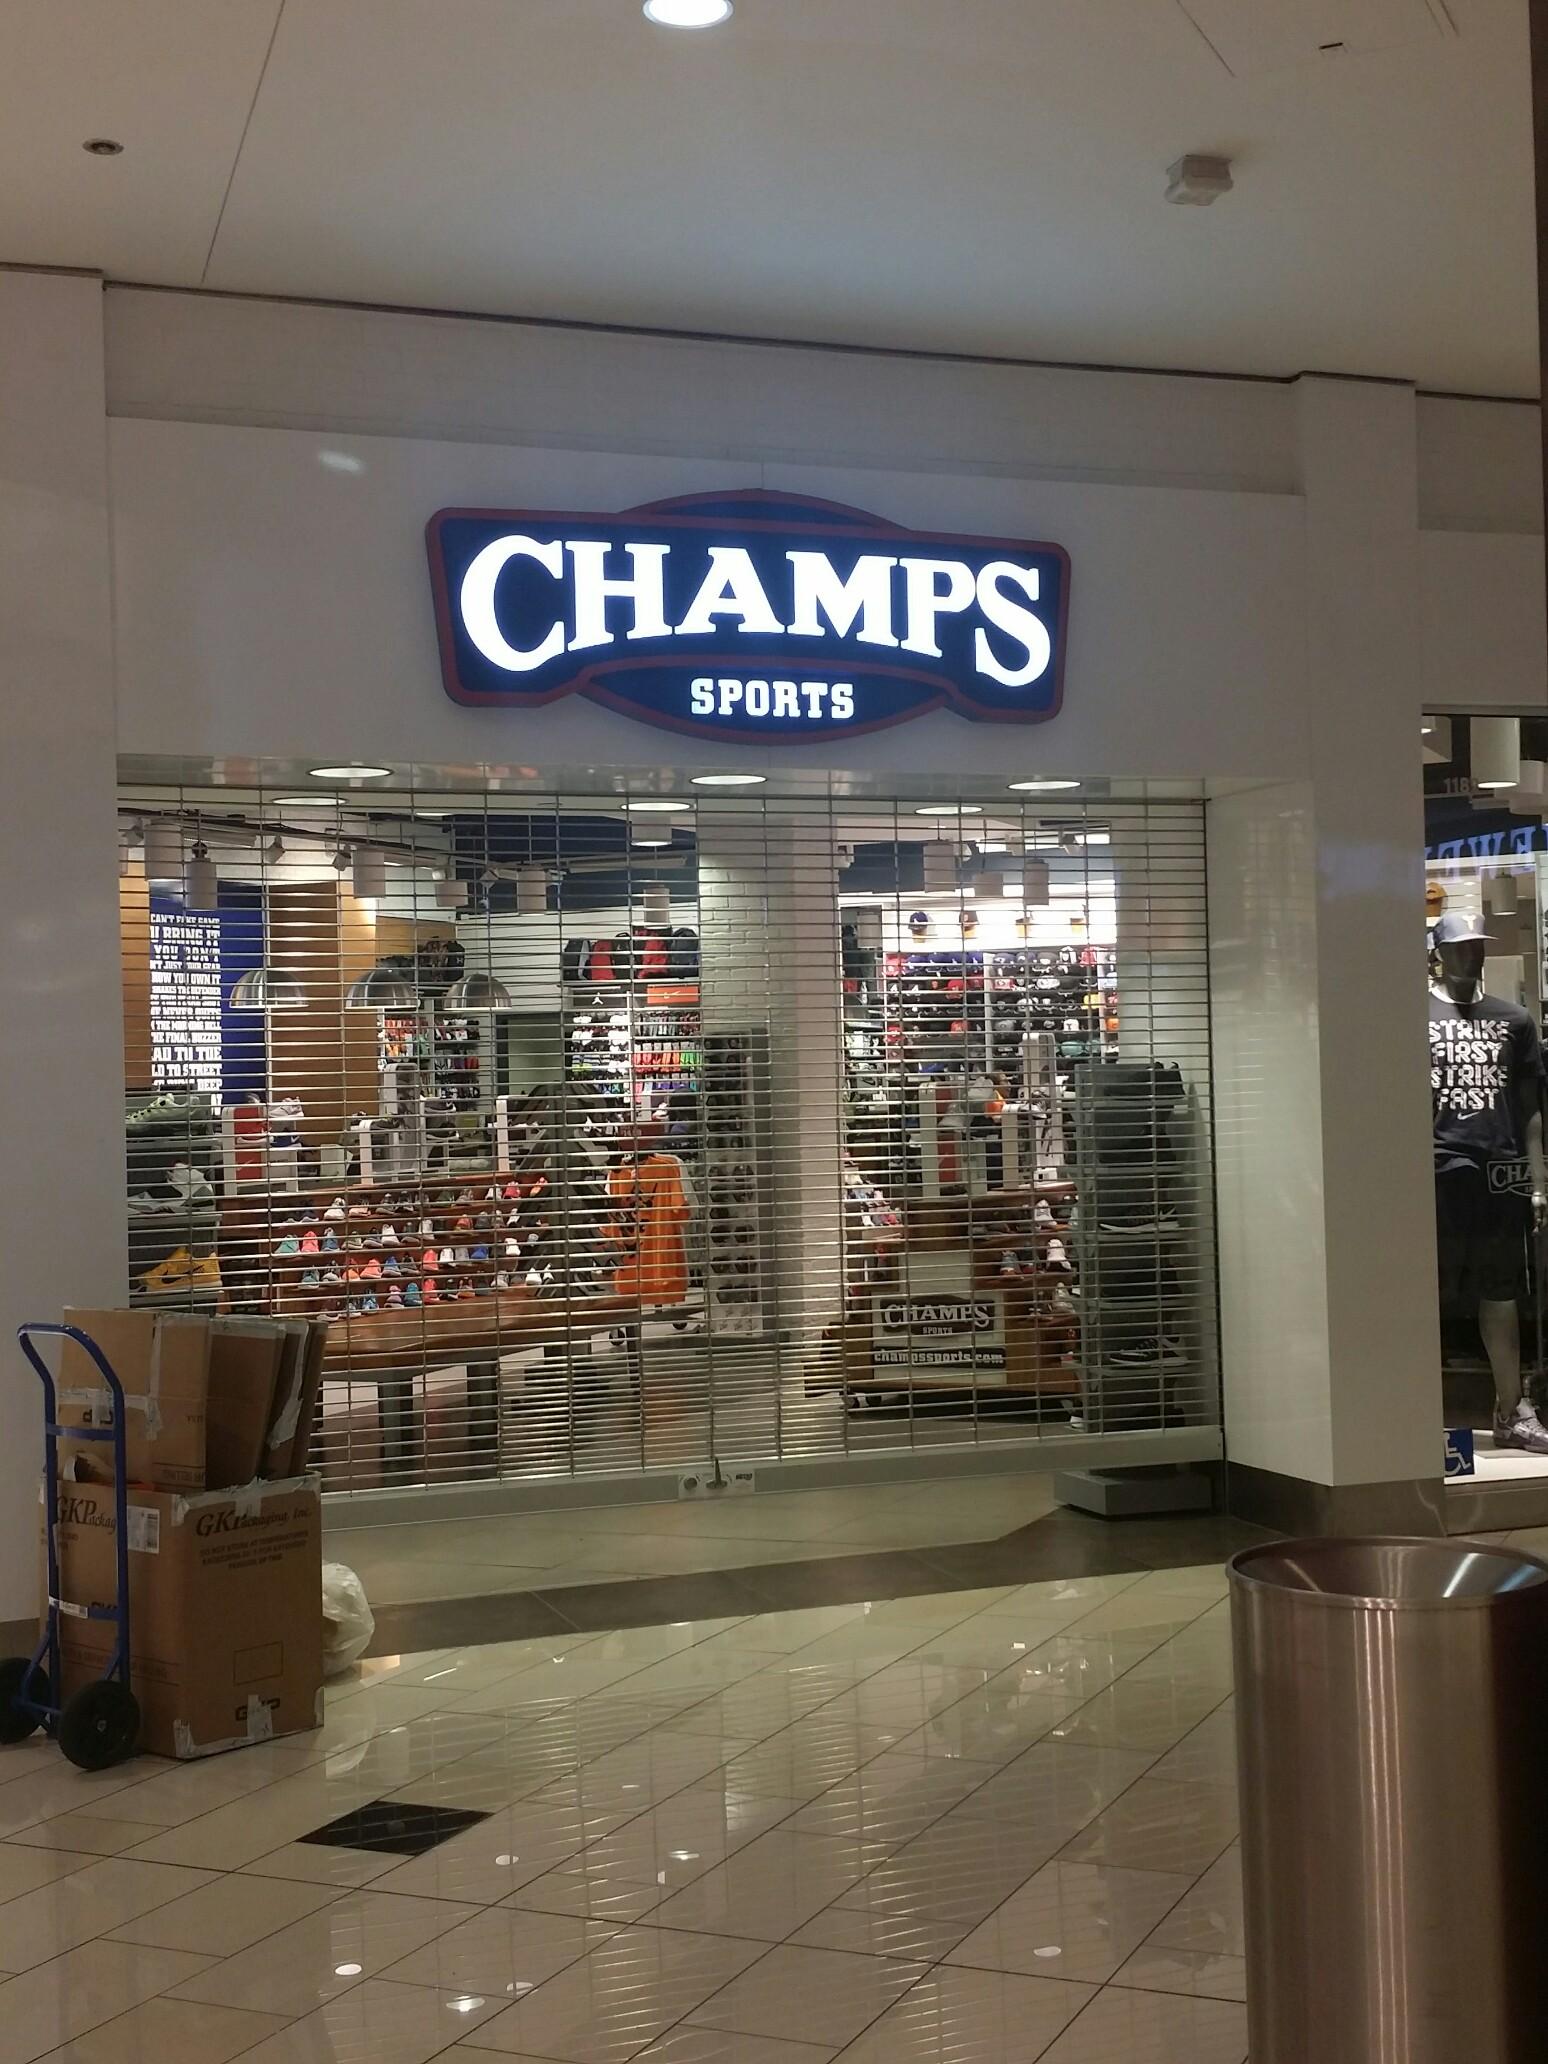 finest selection e03d6 951b5 Champs Sports 1189 Glendale Galleria, Glendale, CA 91210 - YP.com